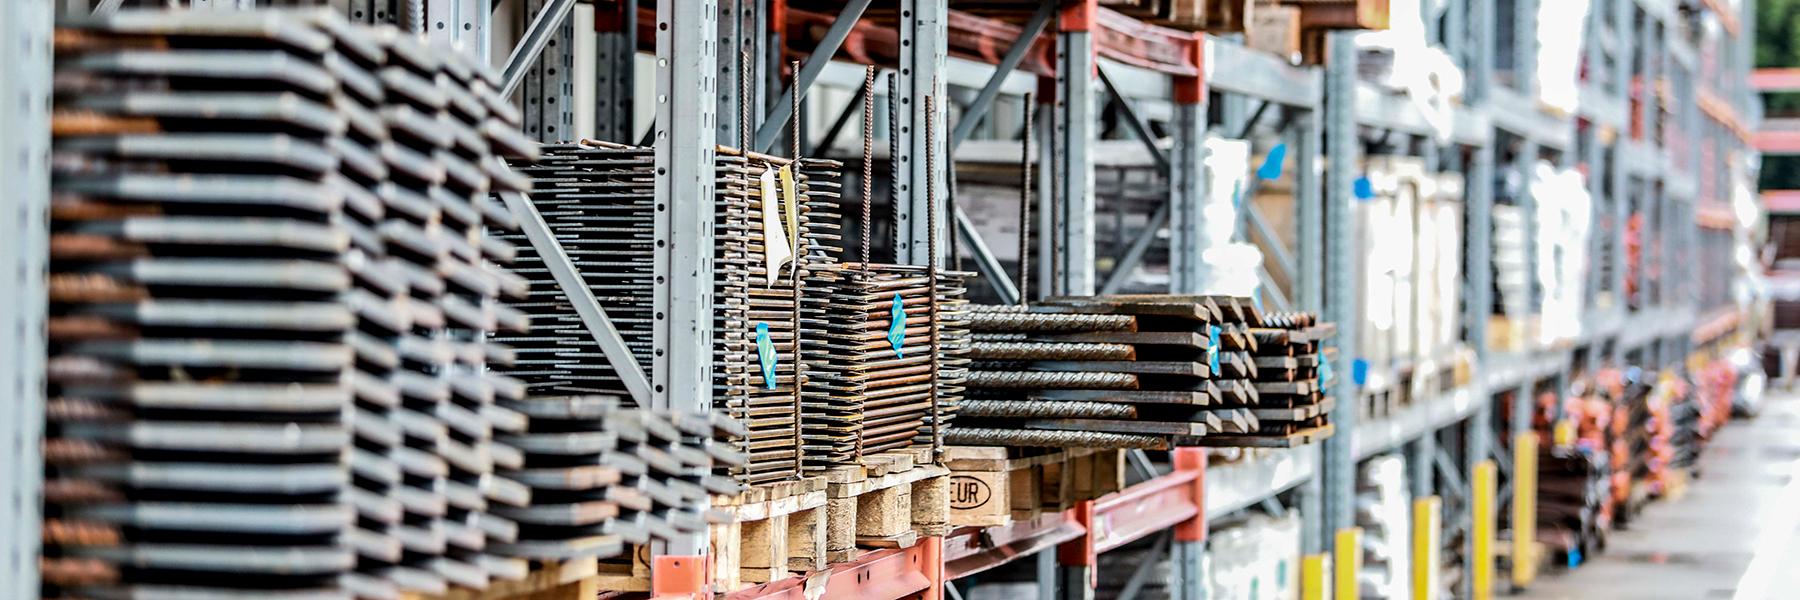 Peikko's steel products on the shelf